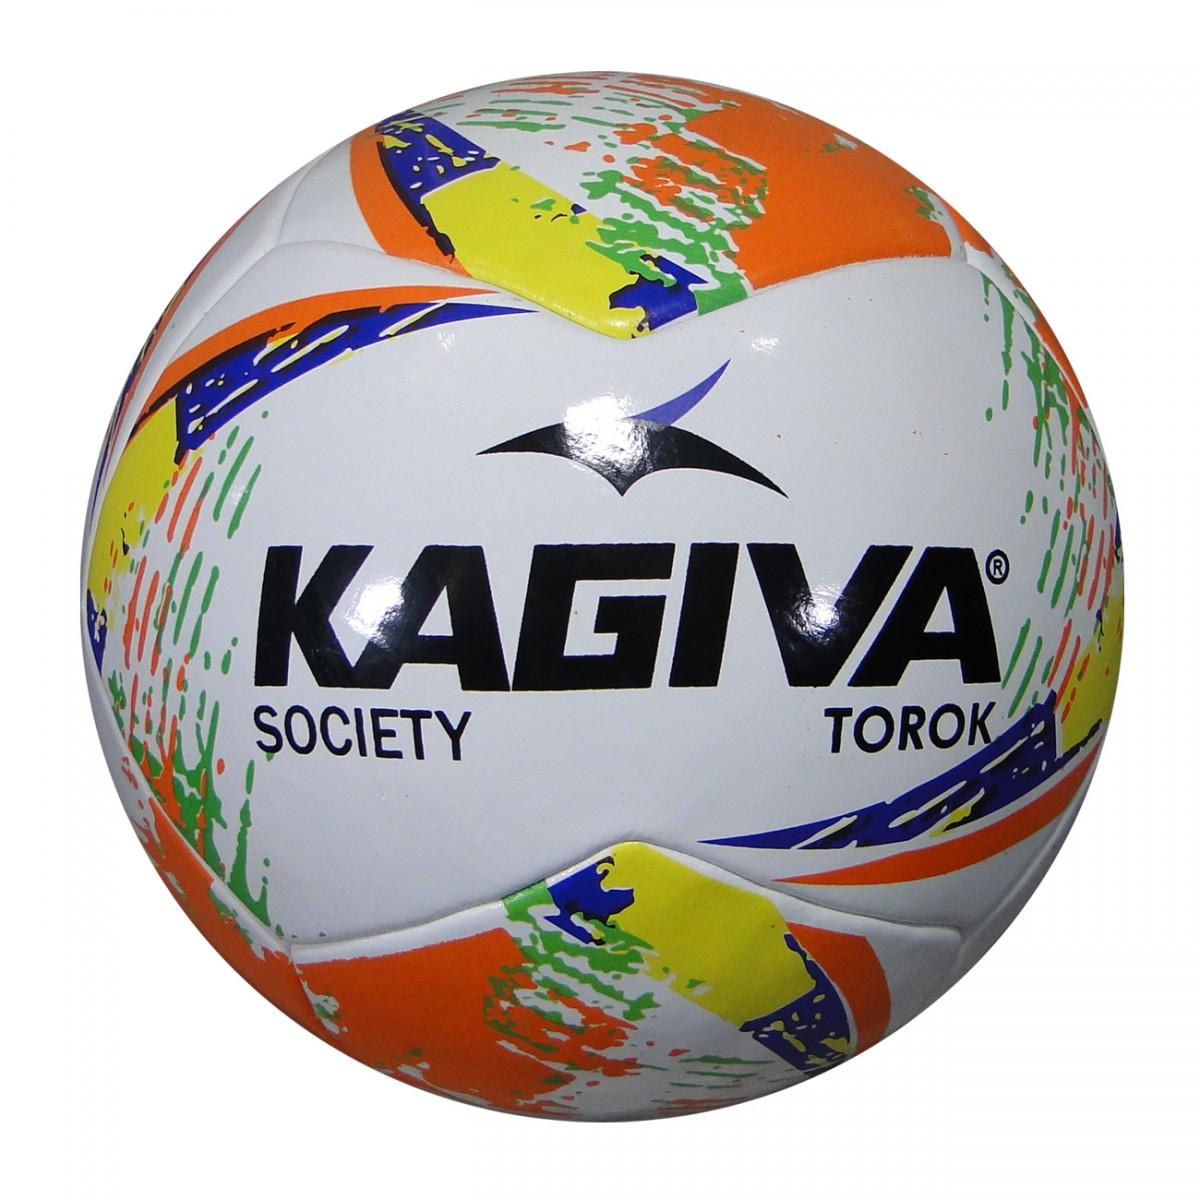 7041f33426 Bola Kagiva Torok Society 0047 - Branco Laranja Amarelo - Chuteira Nike